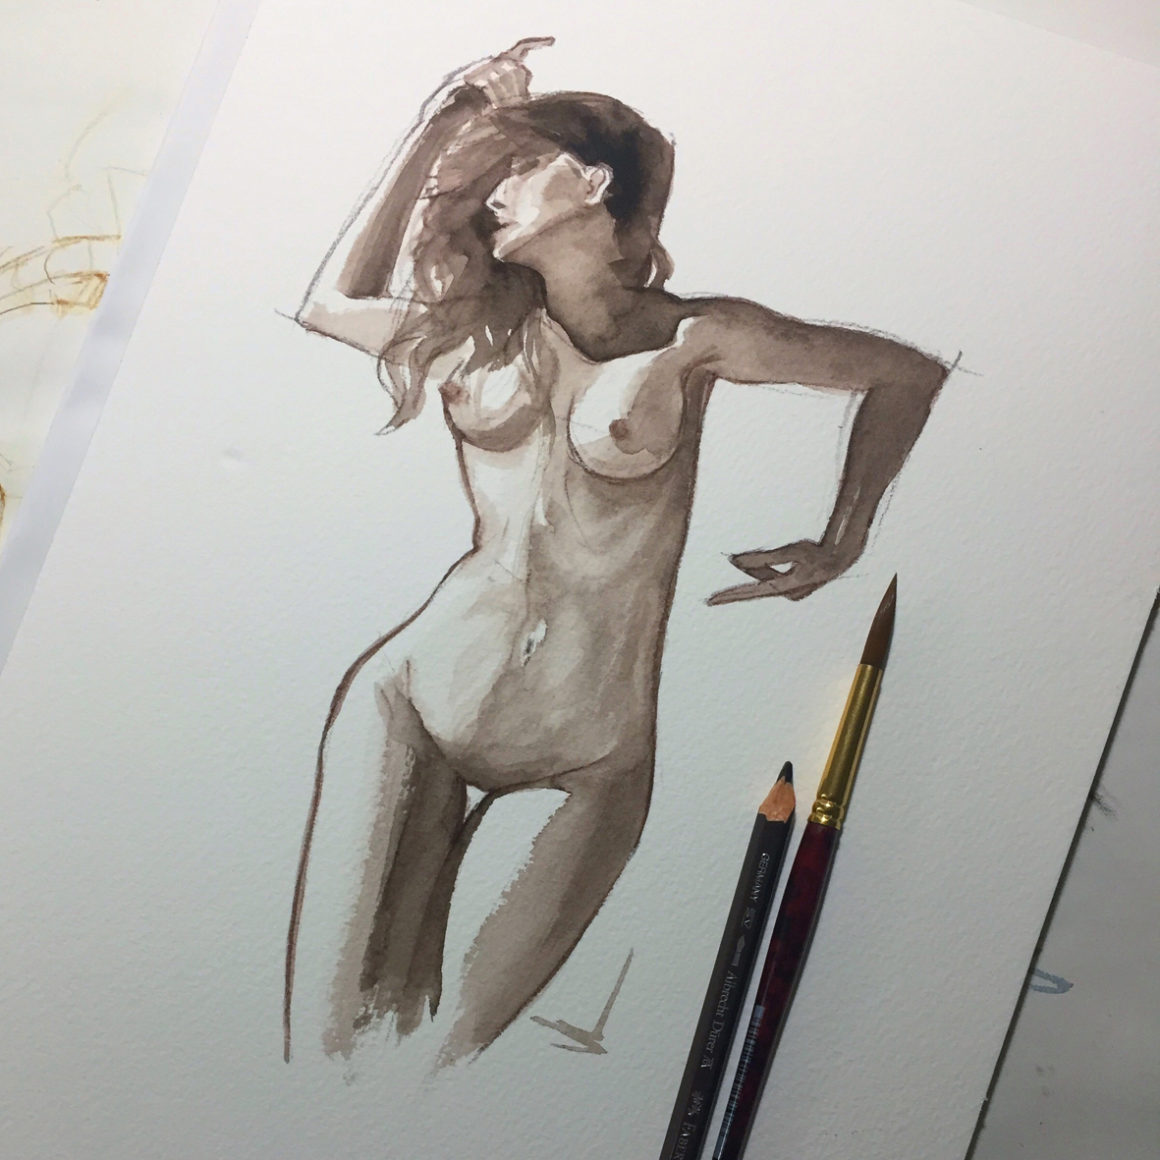 006 Lucy Vito Lentini Designer Acquarelli Sketches